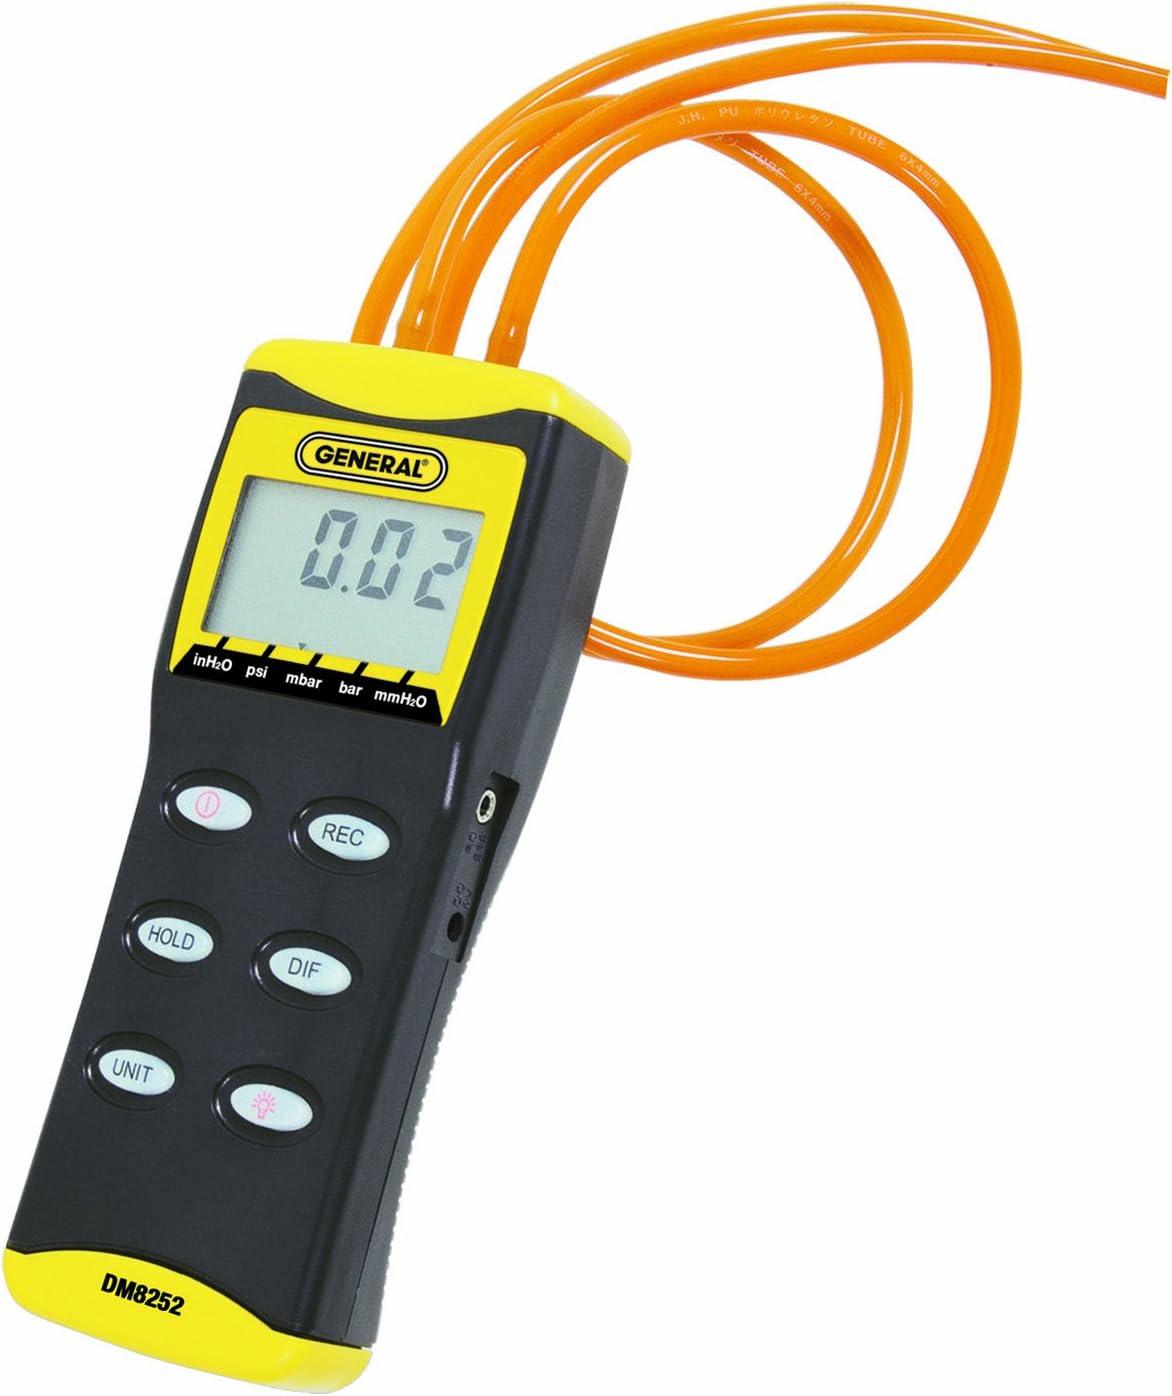 High quality General Tools DMM8252 Hi Digital Brand new Manometer Relolution